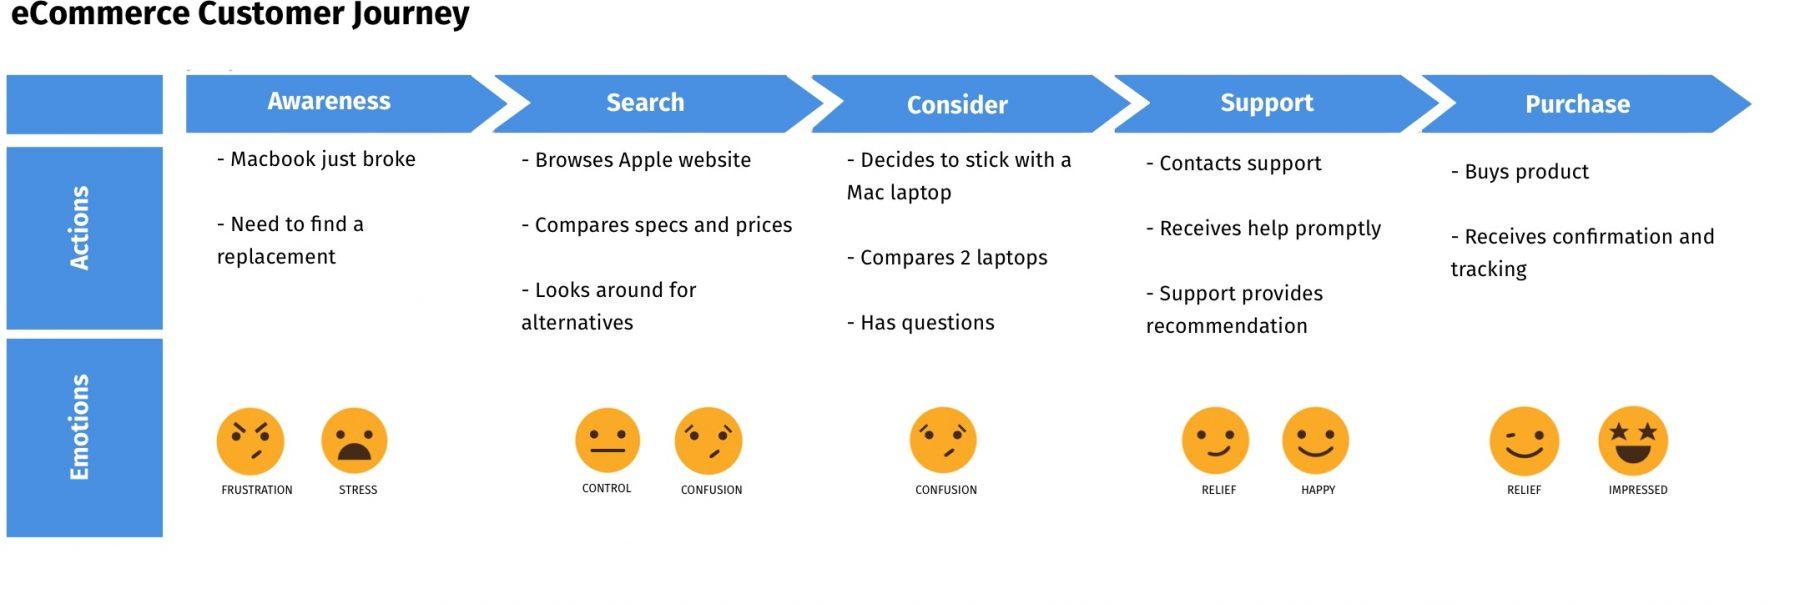 Gather Customer Feedback along the Customer Journey